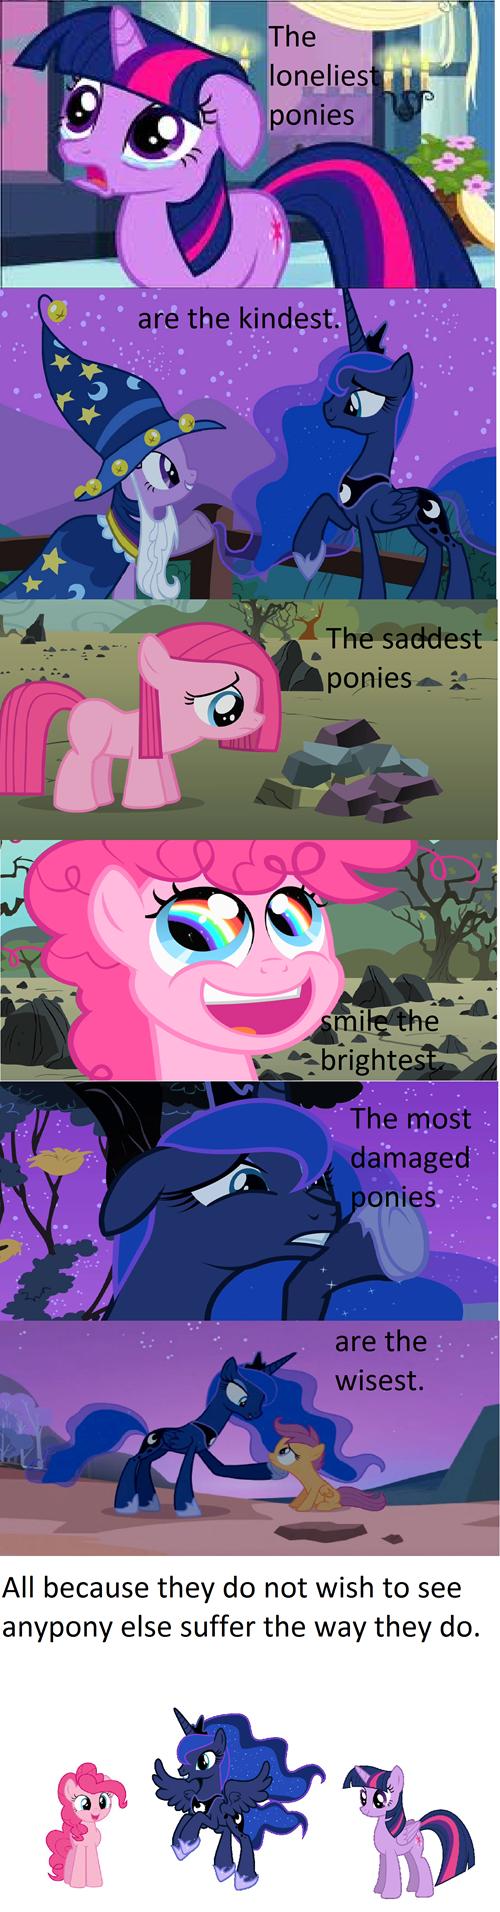 The loneliest ponies